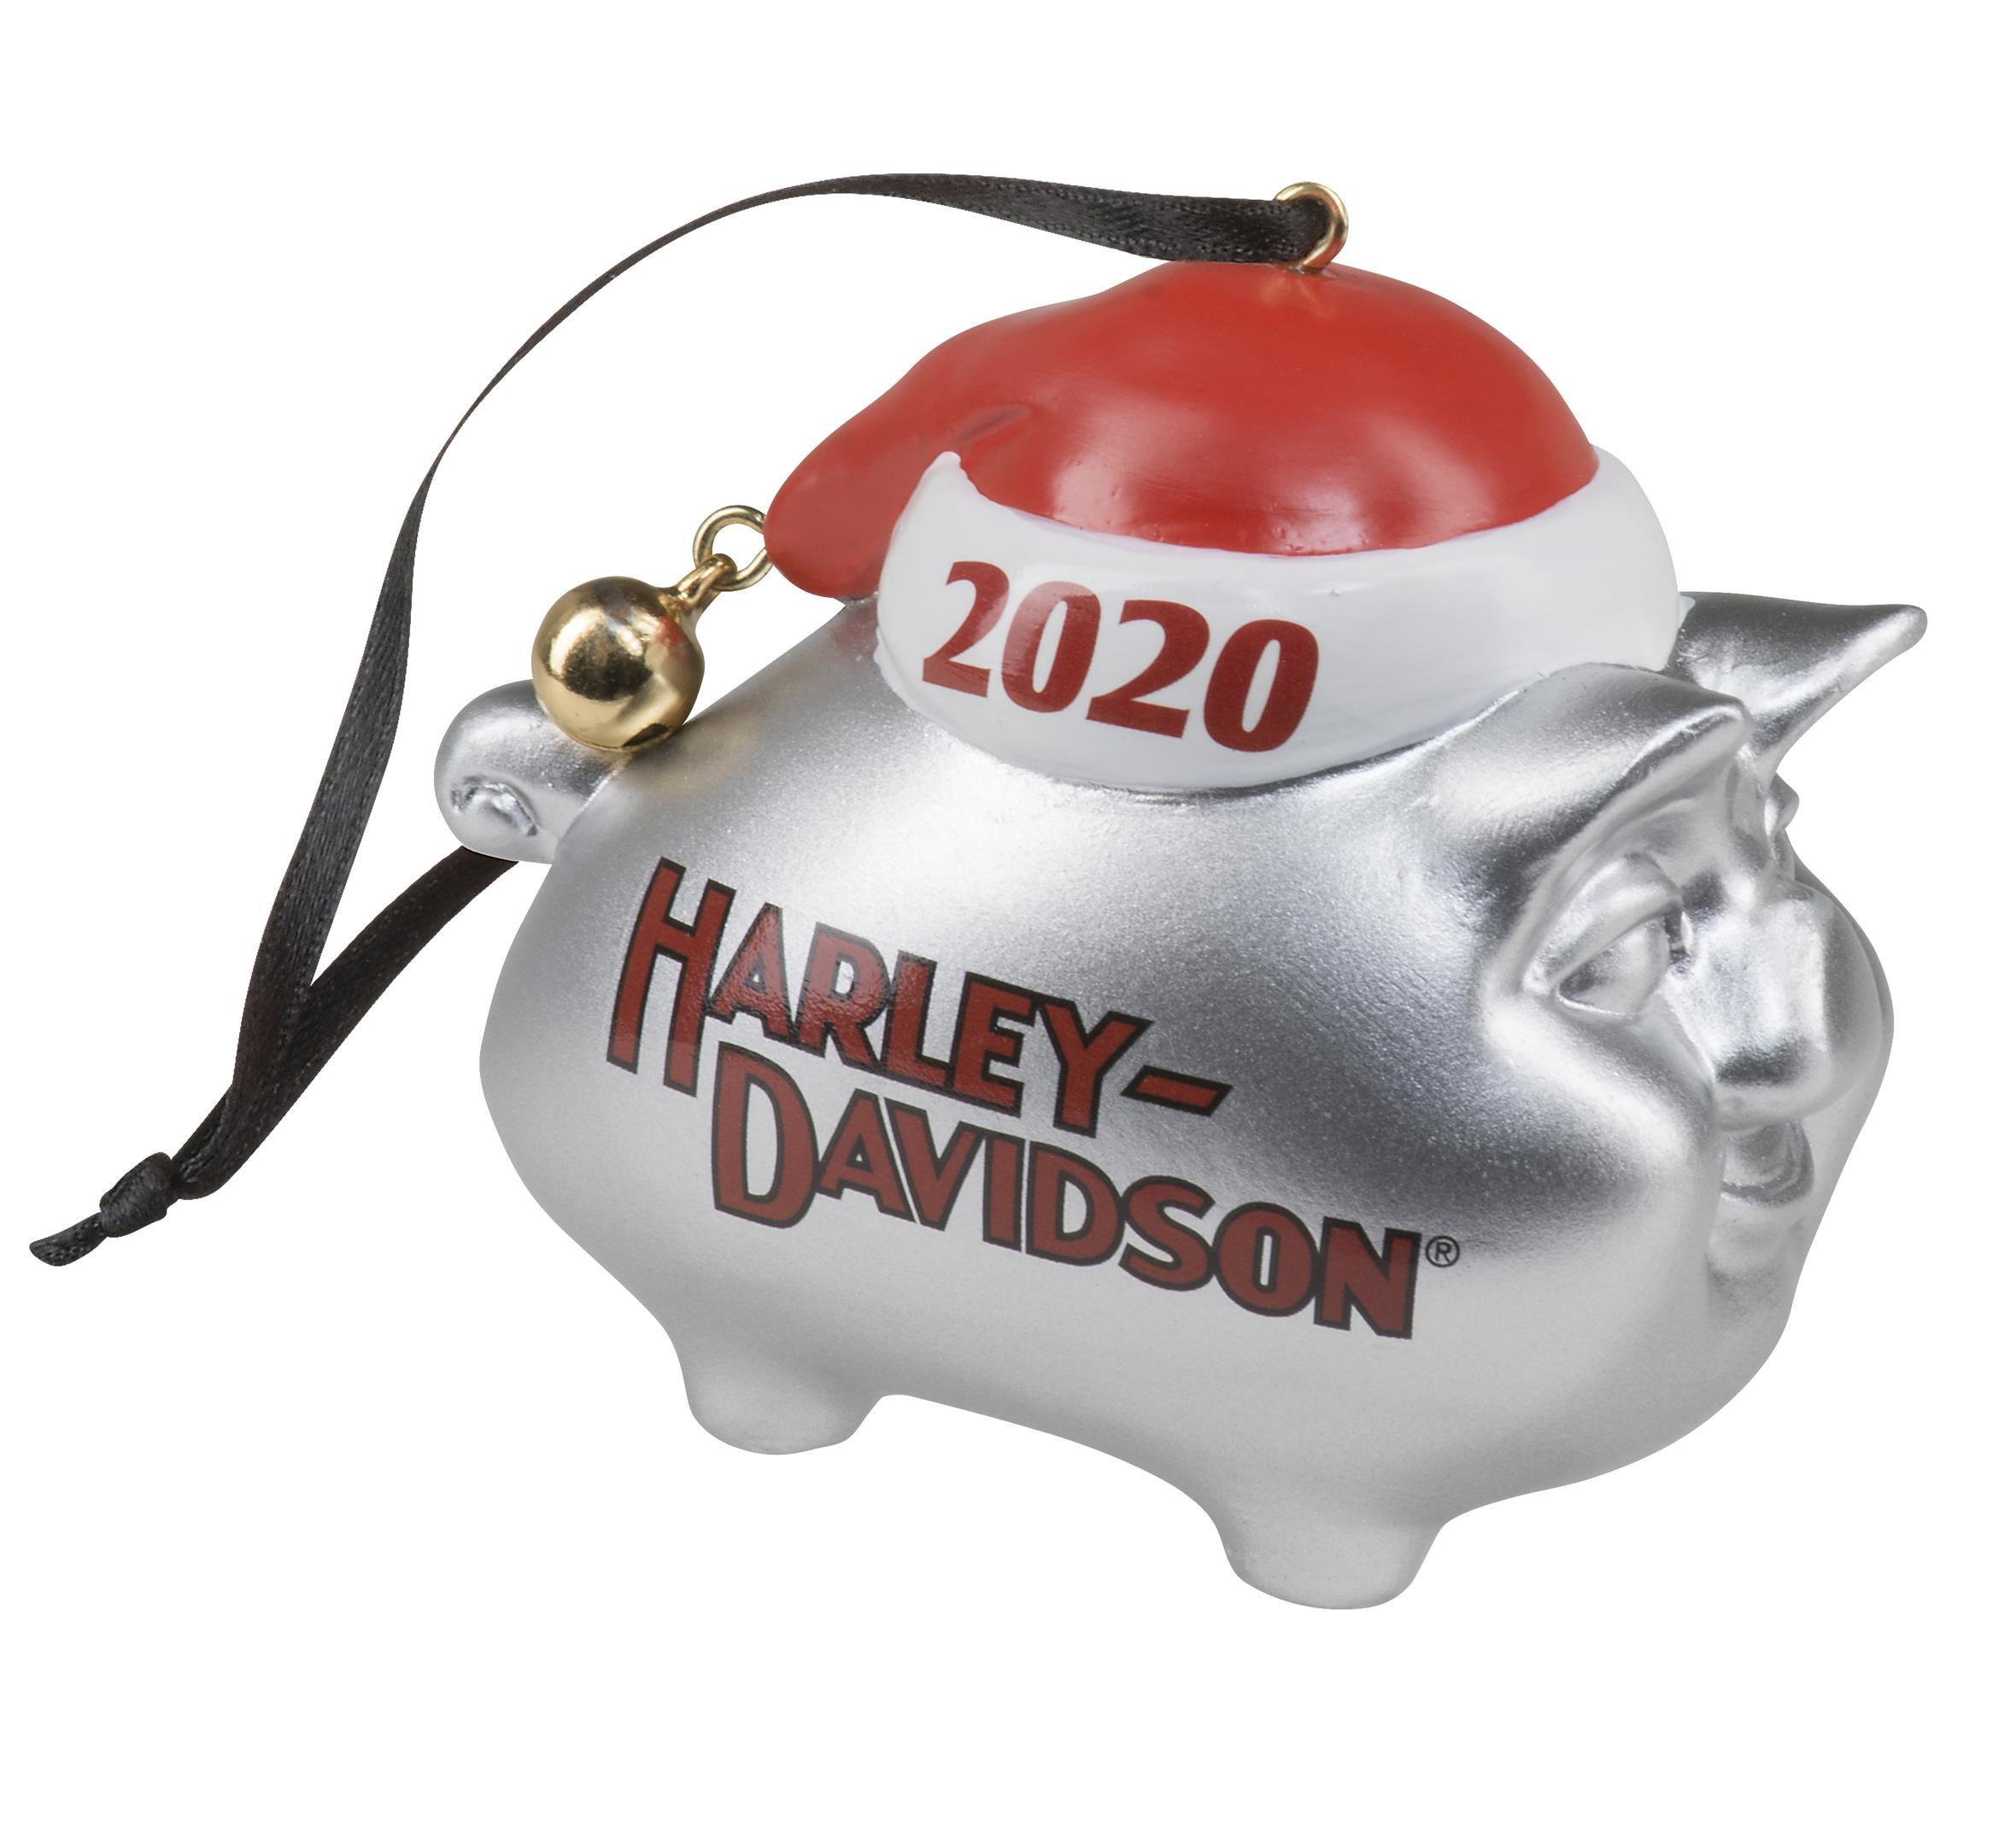 2020 Hog Ornament 98772 21vx Harley Davidson Usa